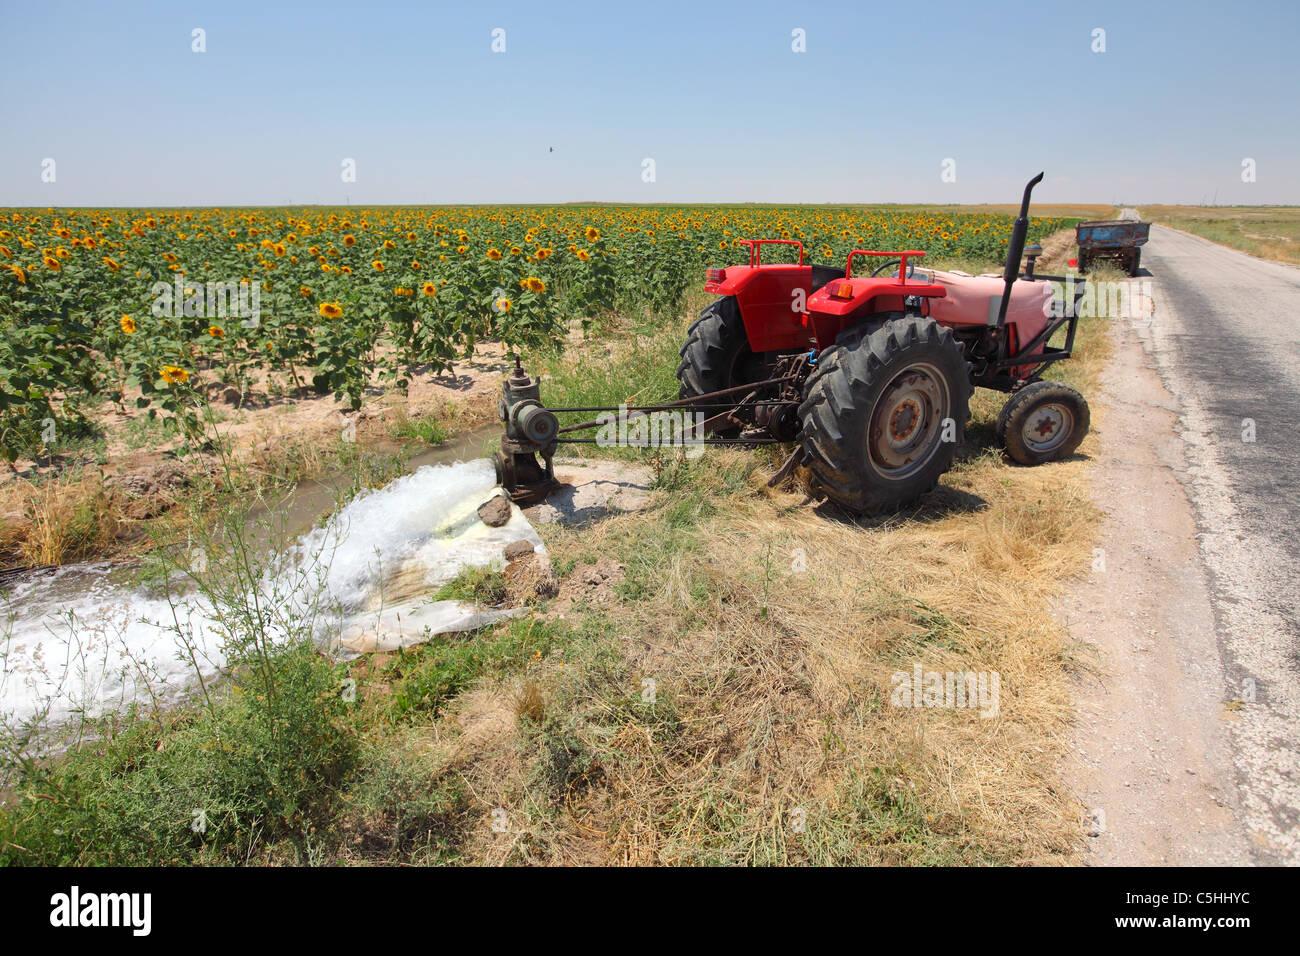 Turkey, Central Anatolia, sunflowers, sunflower, field, irrigation - Stock Image